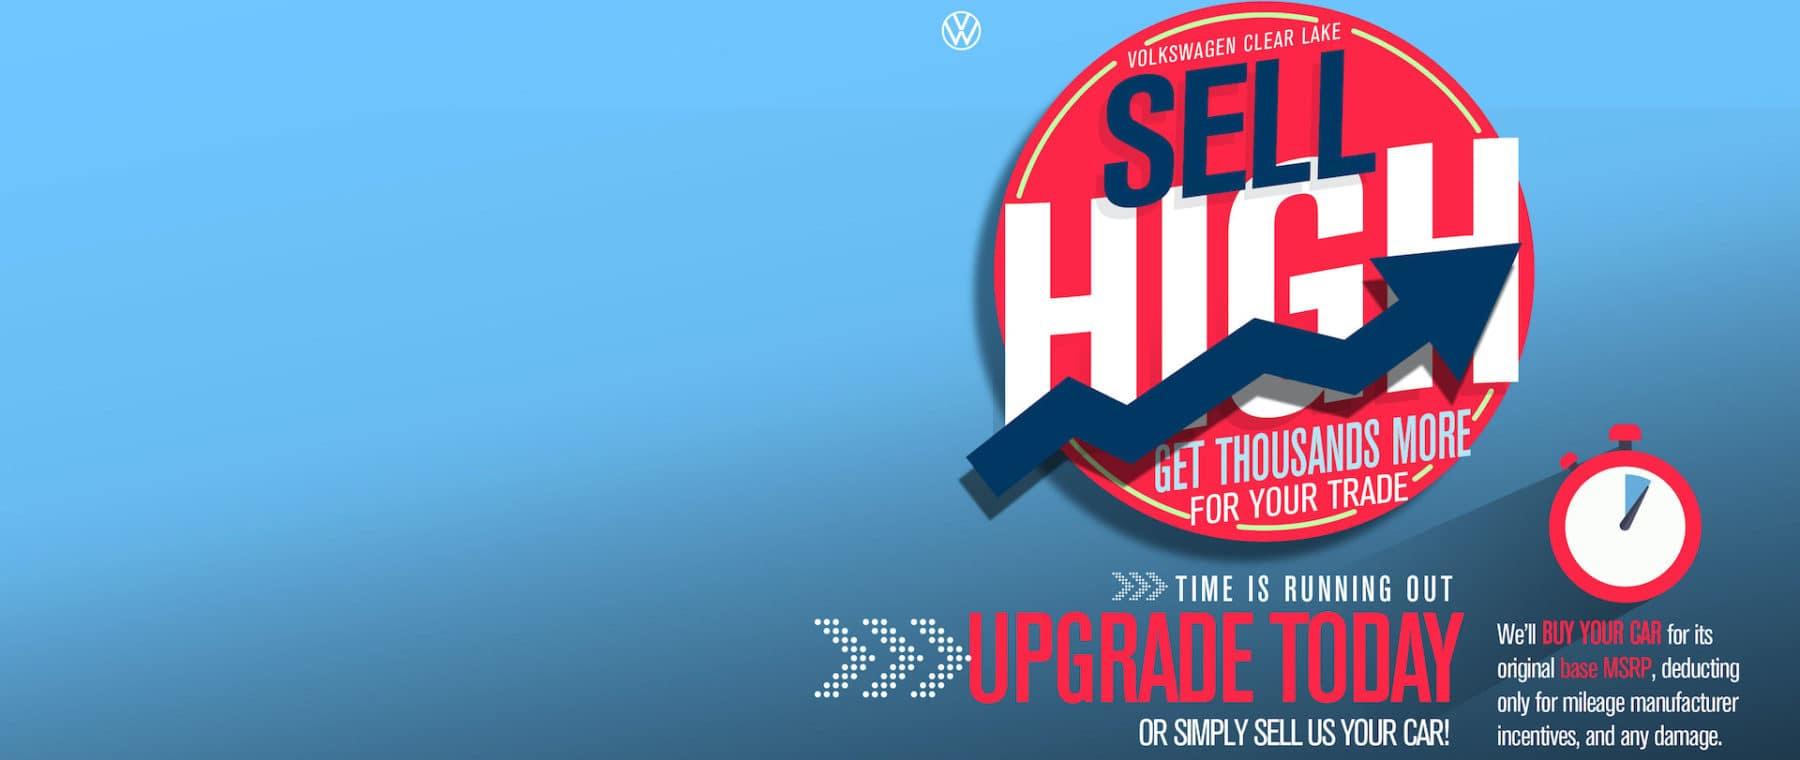 Oct21 CL Sell High Generic_Slider_Hero